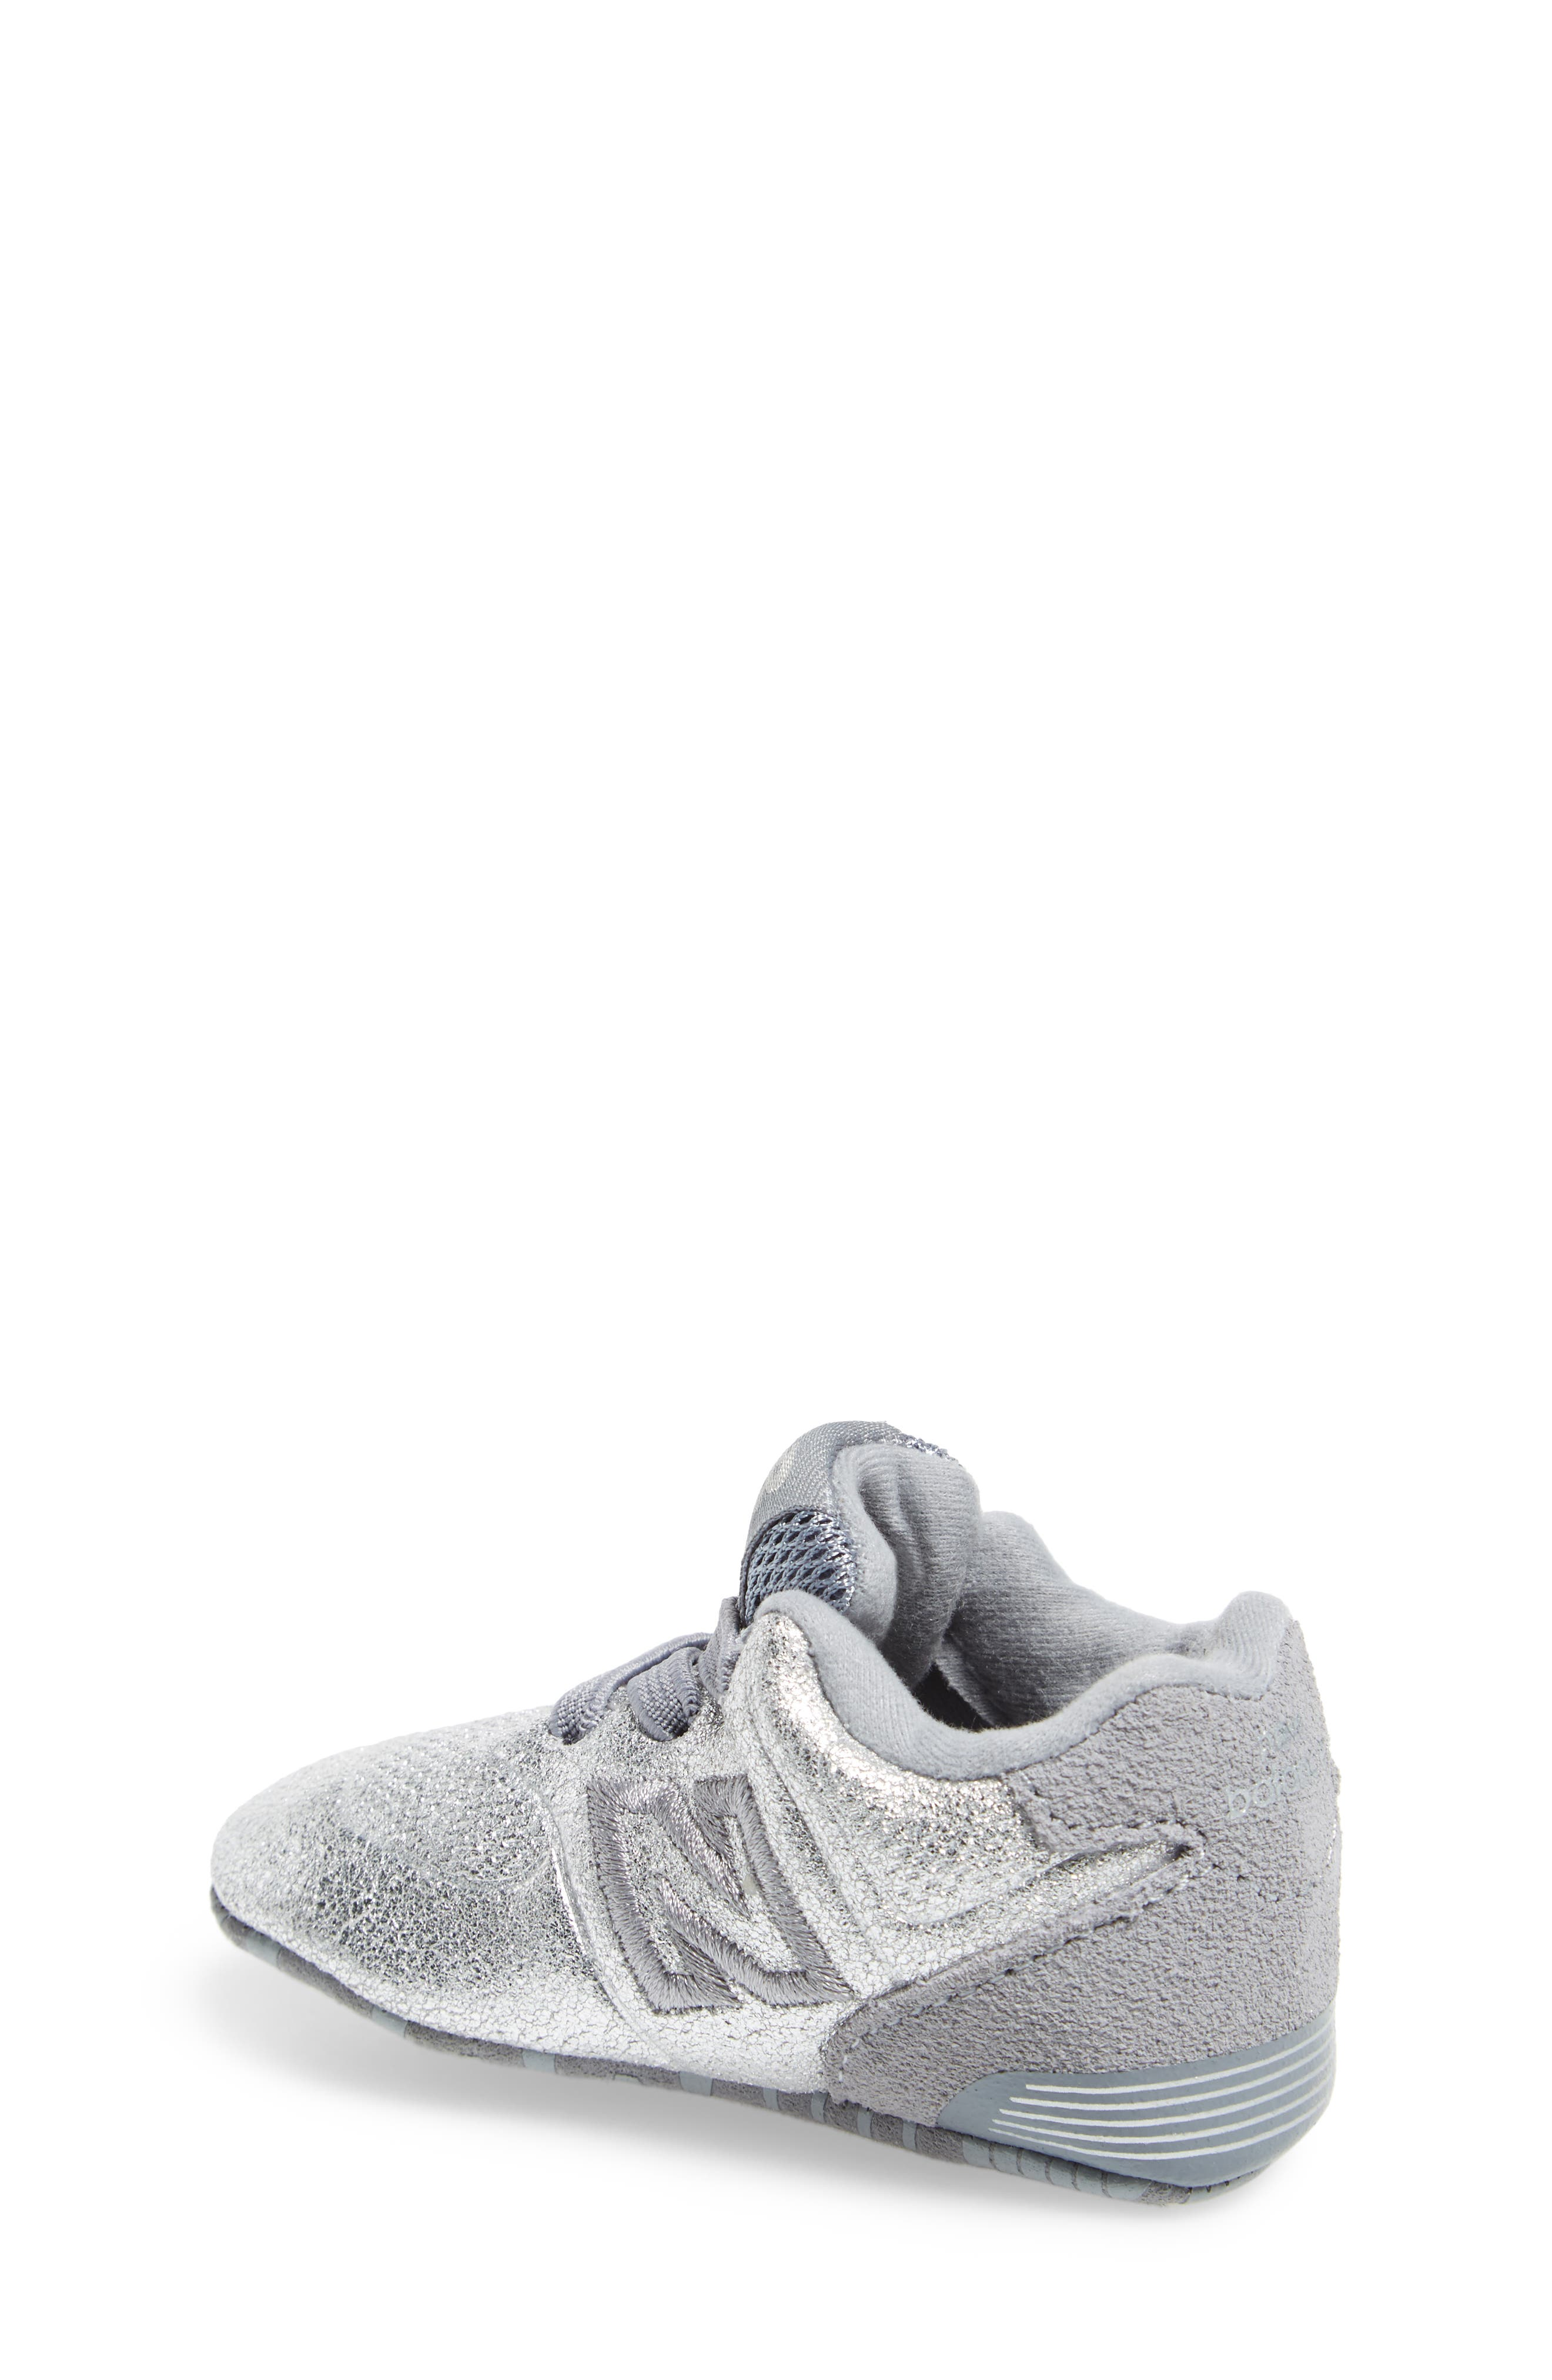 574 Metallic Crib Sneaker,                             Alternate thumbnail 3, color,